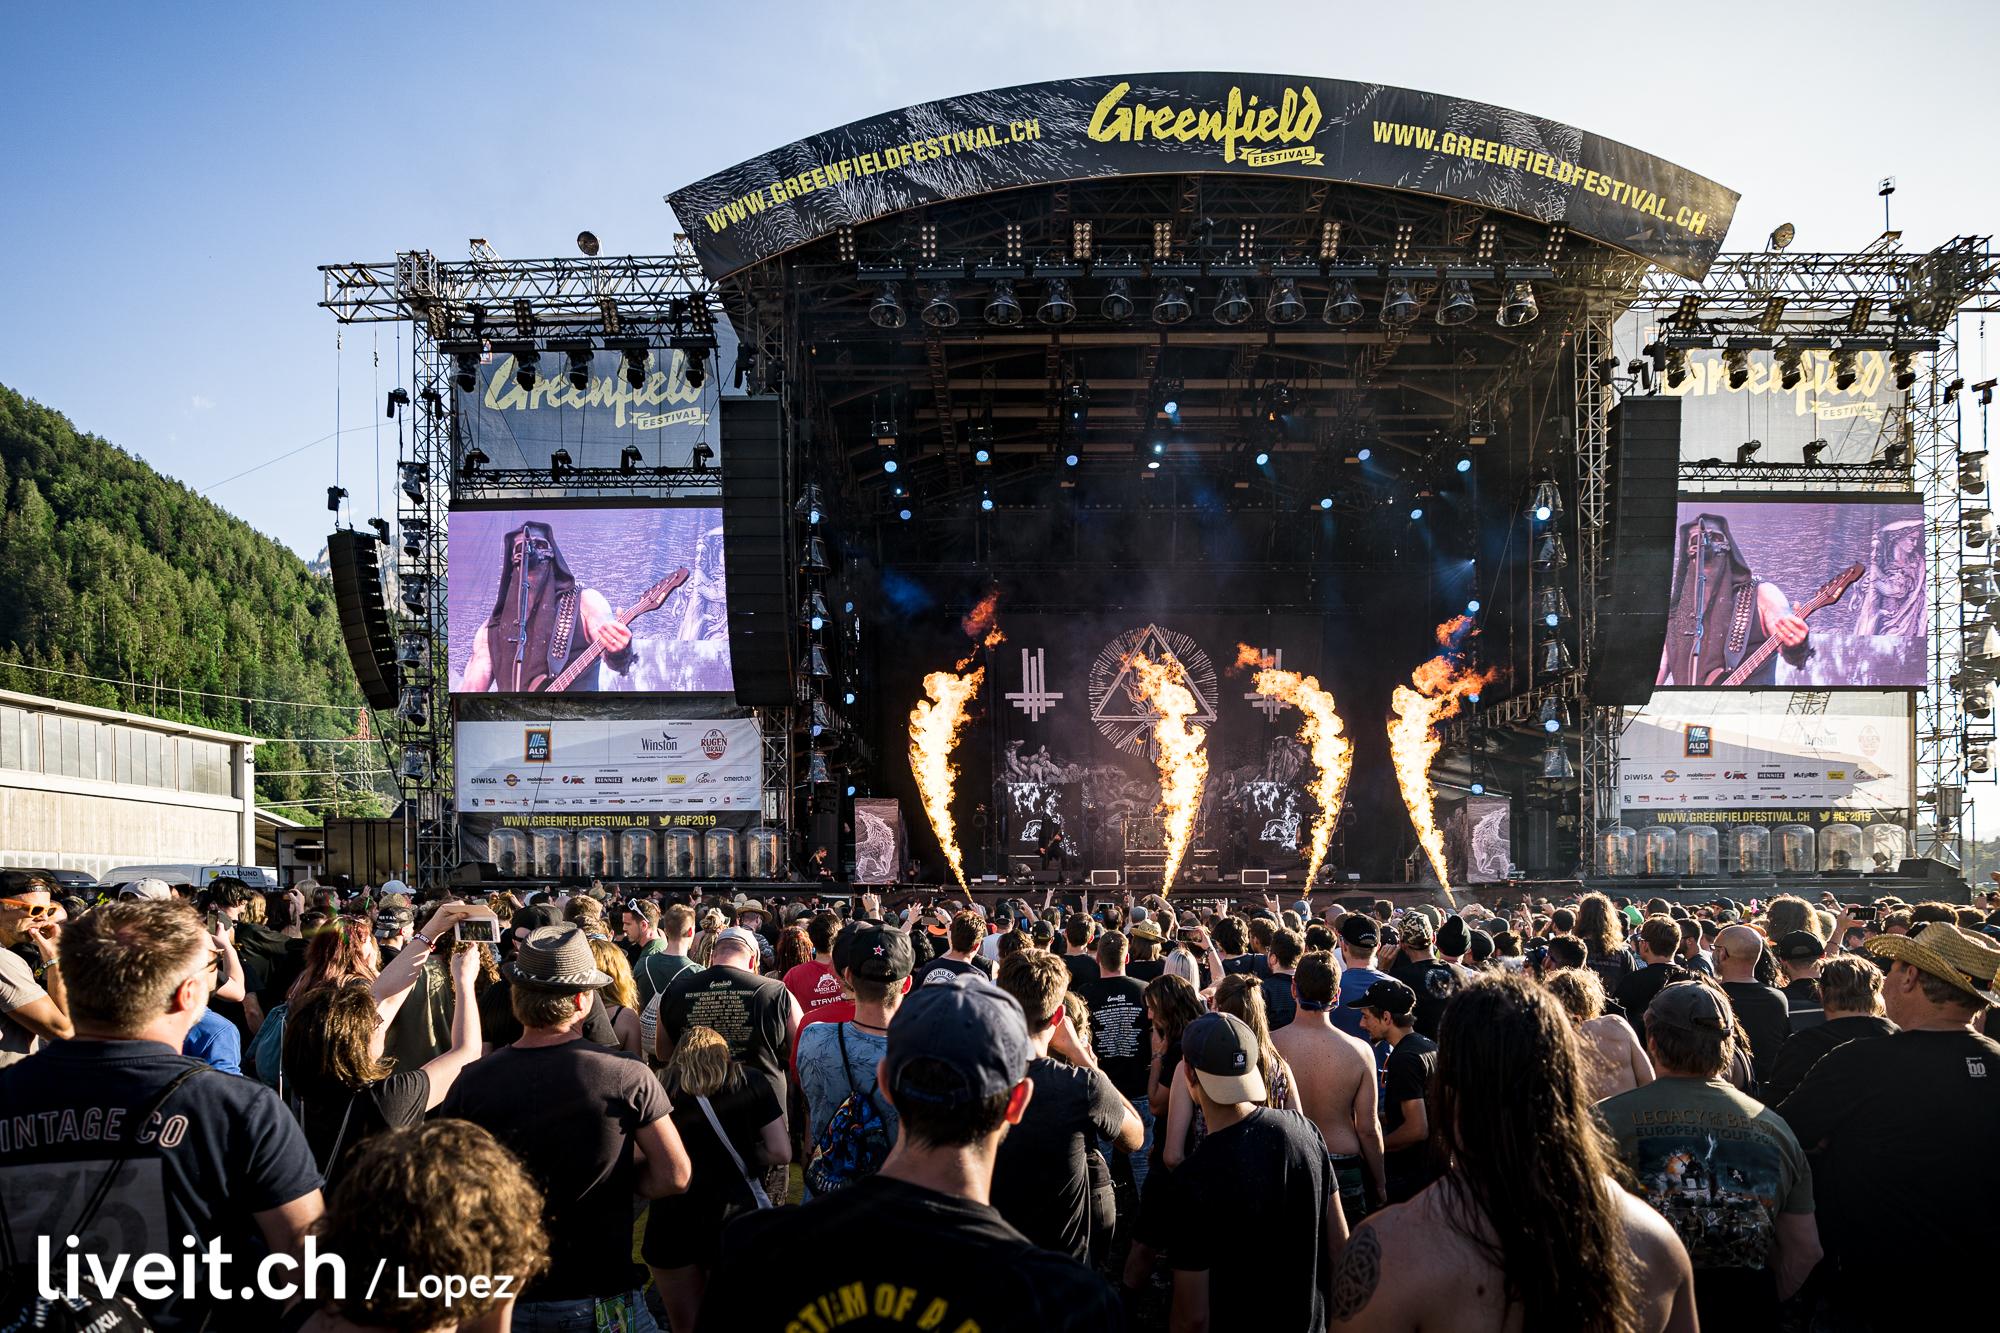 SCHWEIZ GREENFIELD FESTIVAL 2019 Behemoth